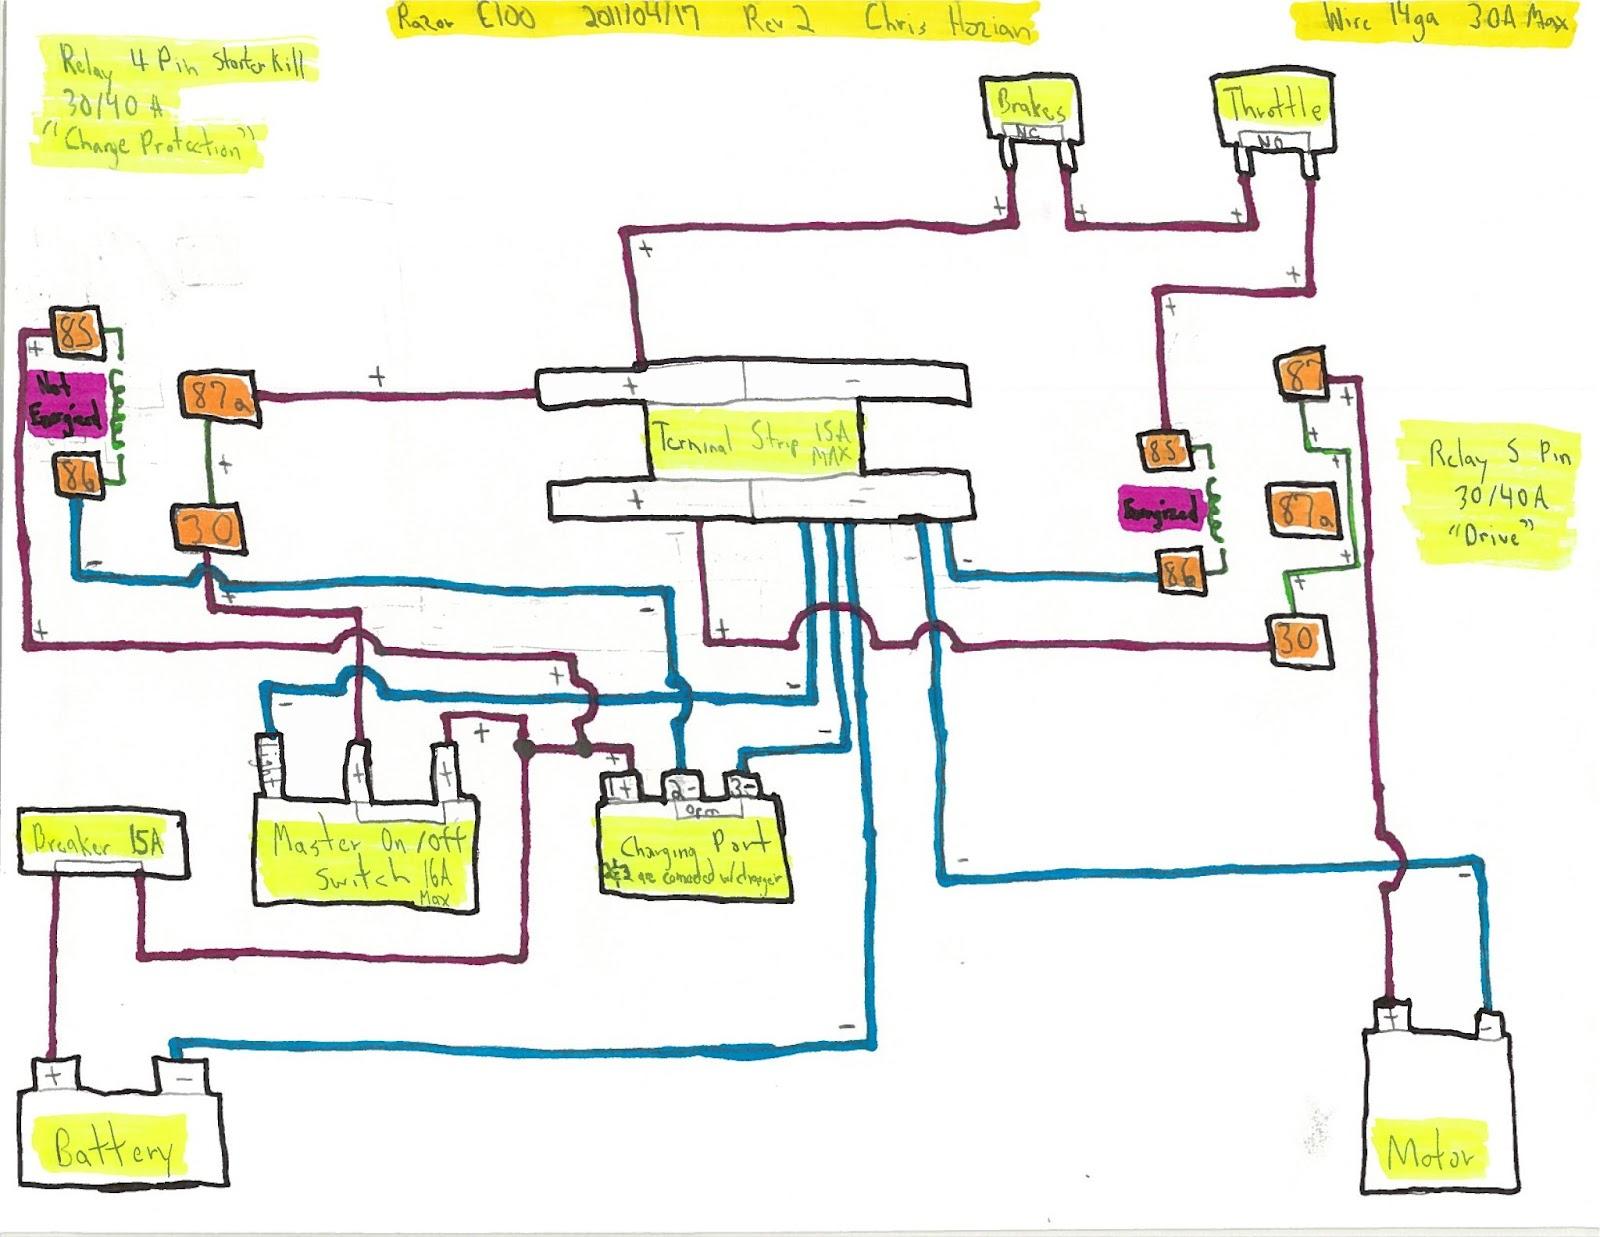 satellite electric scooter razor wiring diagram 12v trusted wiring electric  motor wiring diagram electric scooter wiring